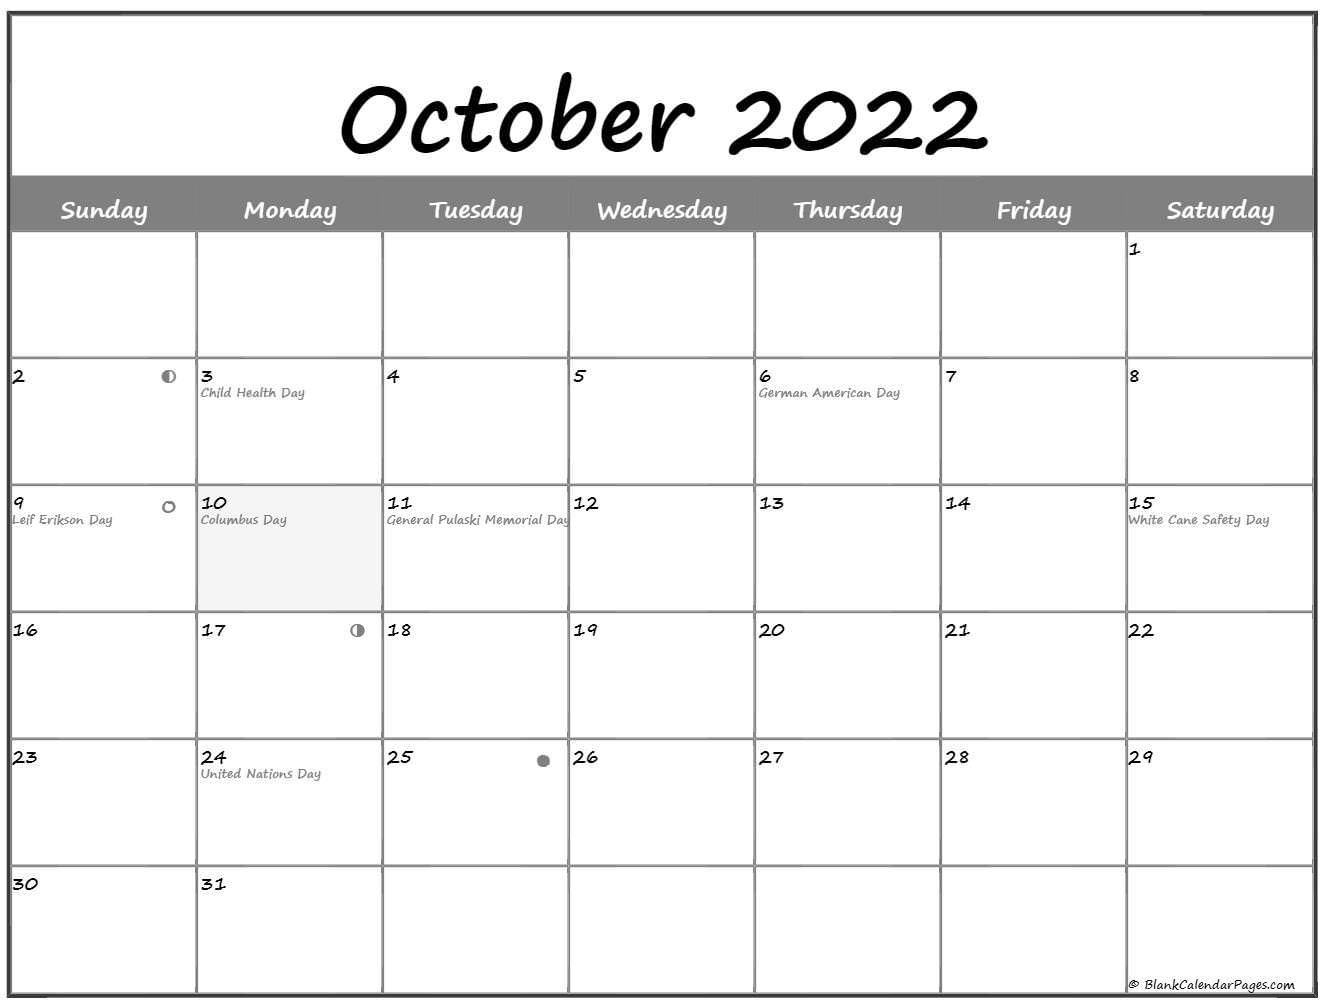 October 2022 Lunar Calendar | Moon Phase Calendar In 2022 Calendar March And April